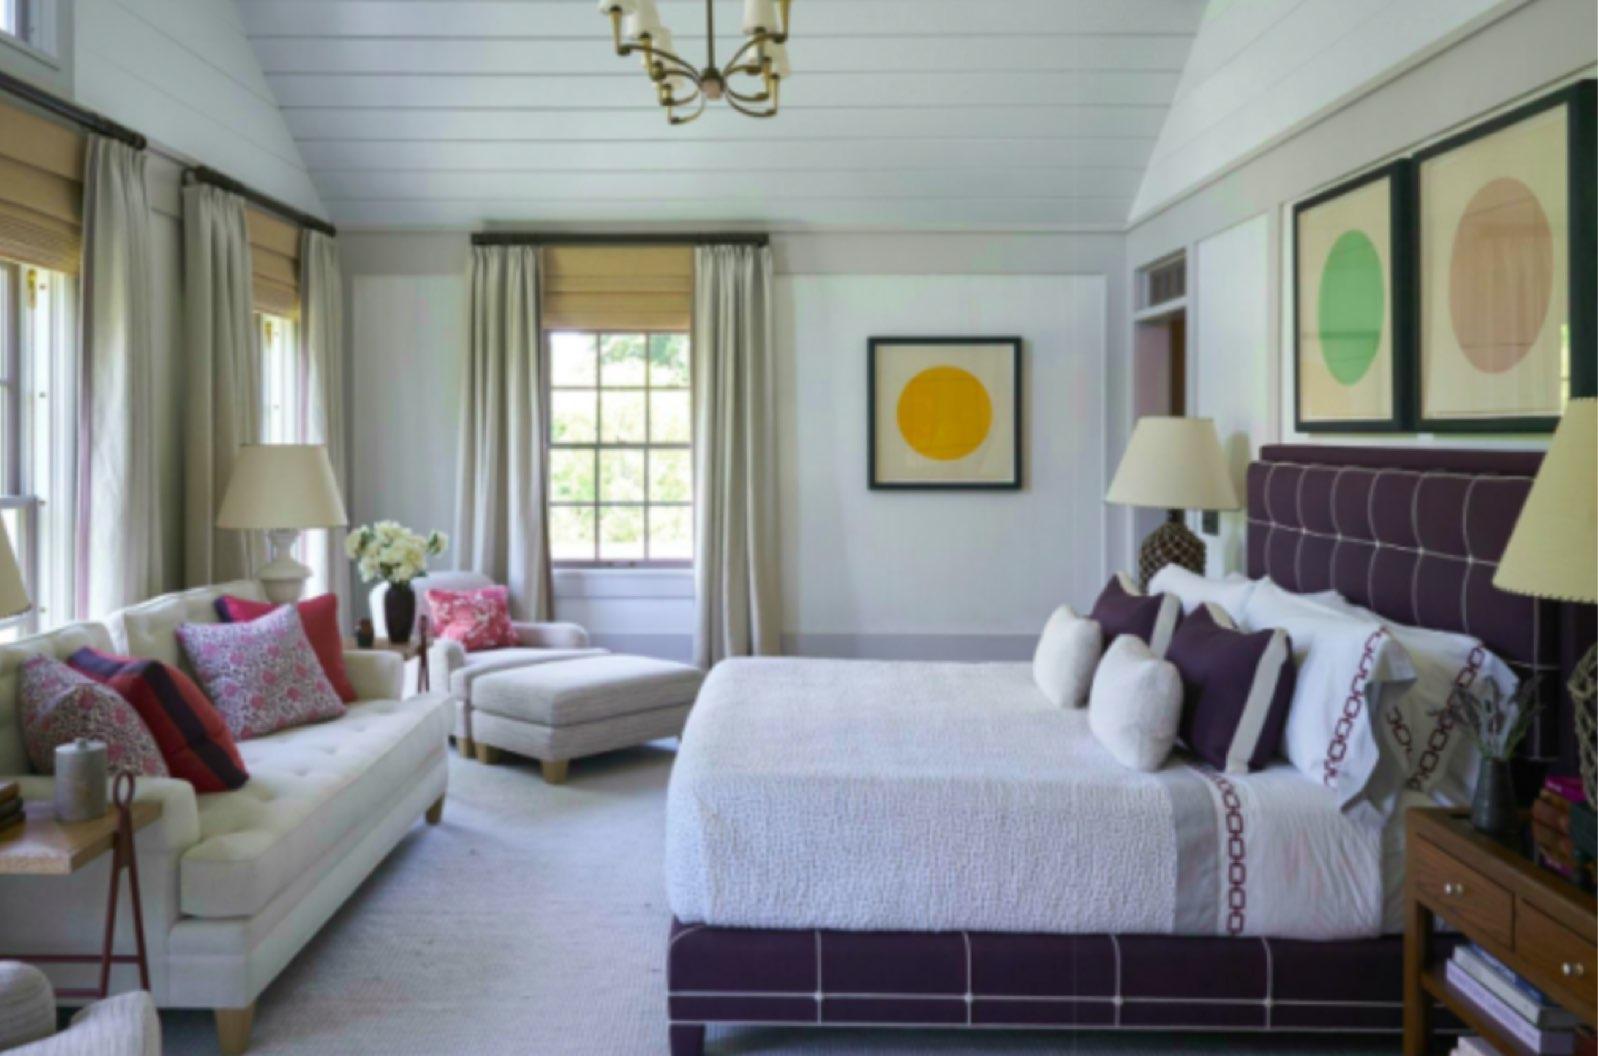 steven gambrel bedroom - Google Search.jpg